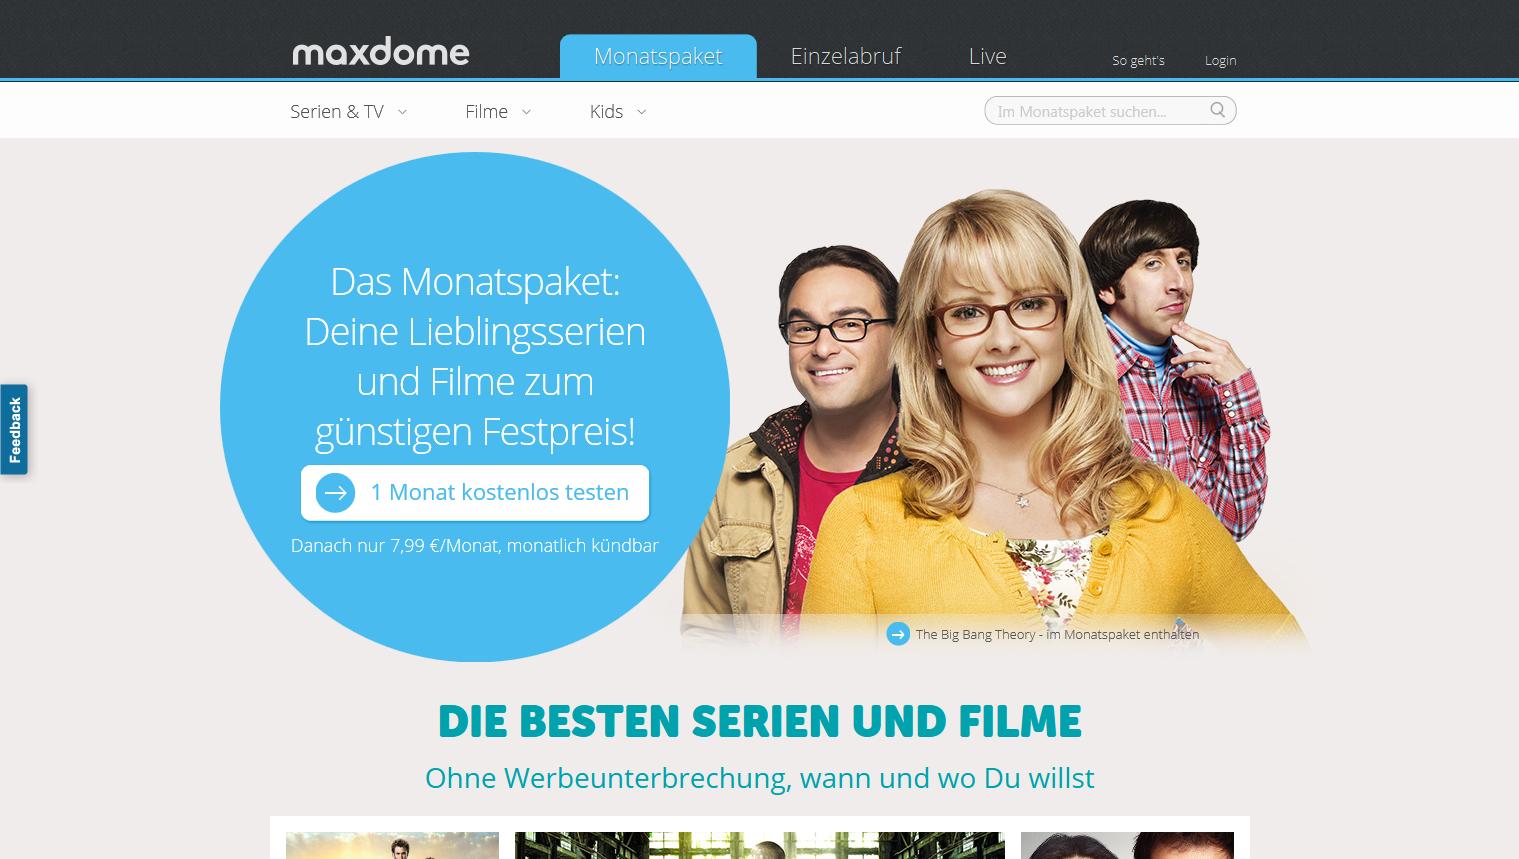 FireShot Screen Capture #001 - 'maxdome - Video on Demand - Deutschlands beliebteste Online-Videothek' - www_maxdome_de